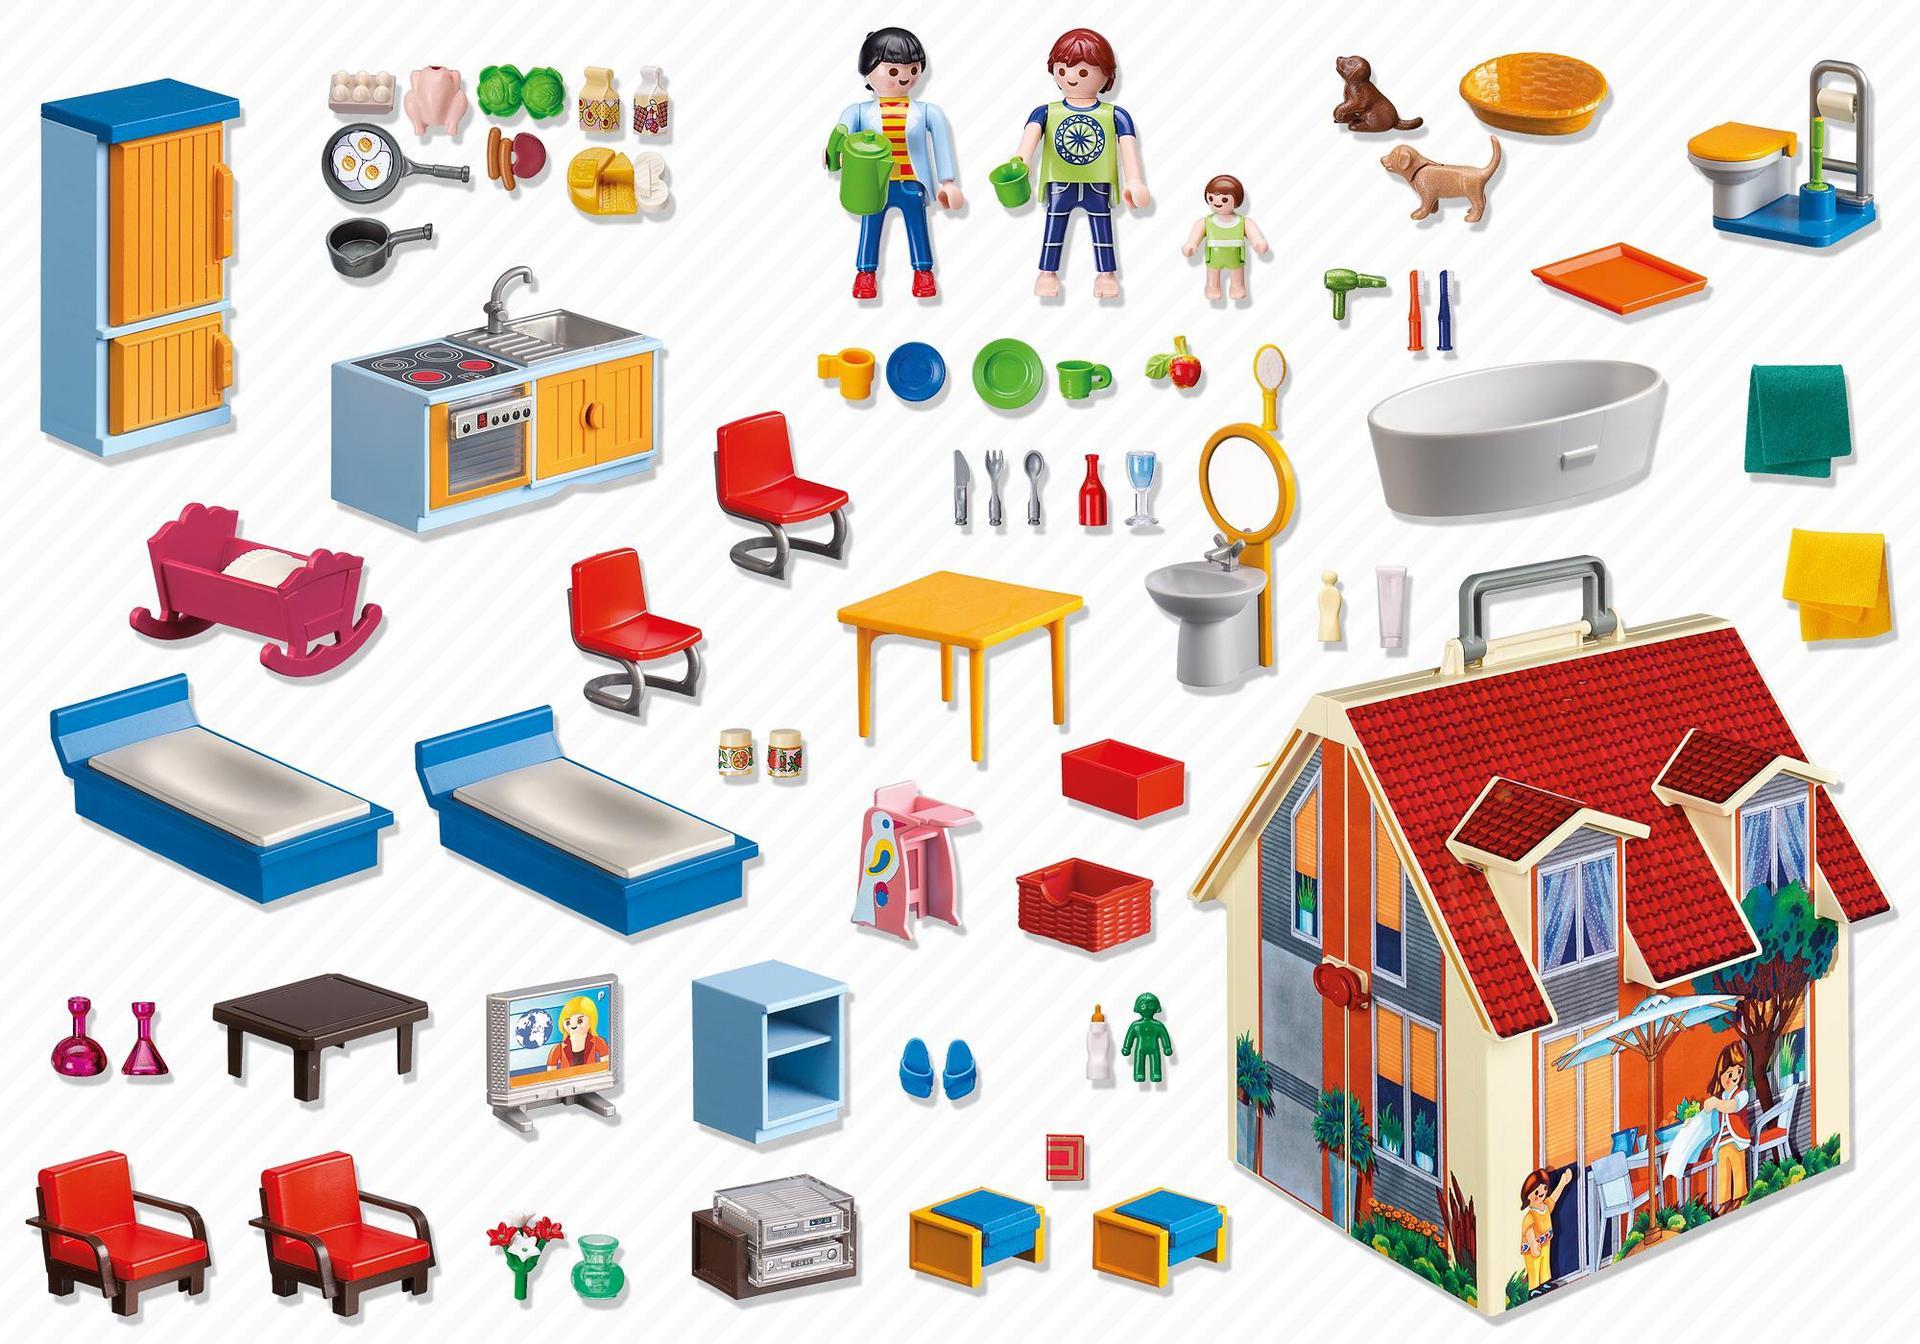 Take Along Modern Doll House - 5167 - PLAYMOBIL® United Kingdom